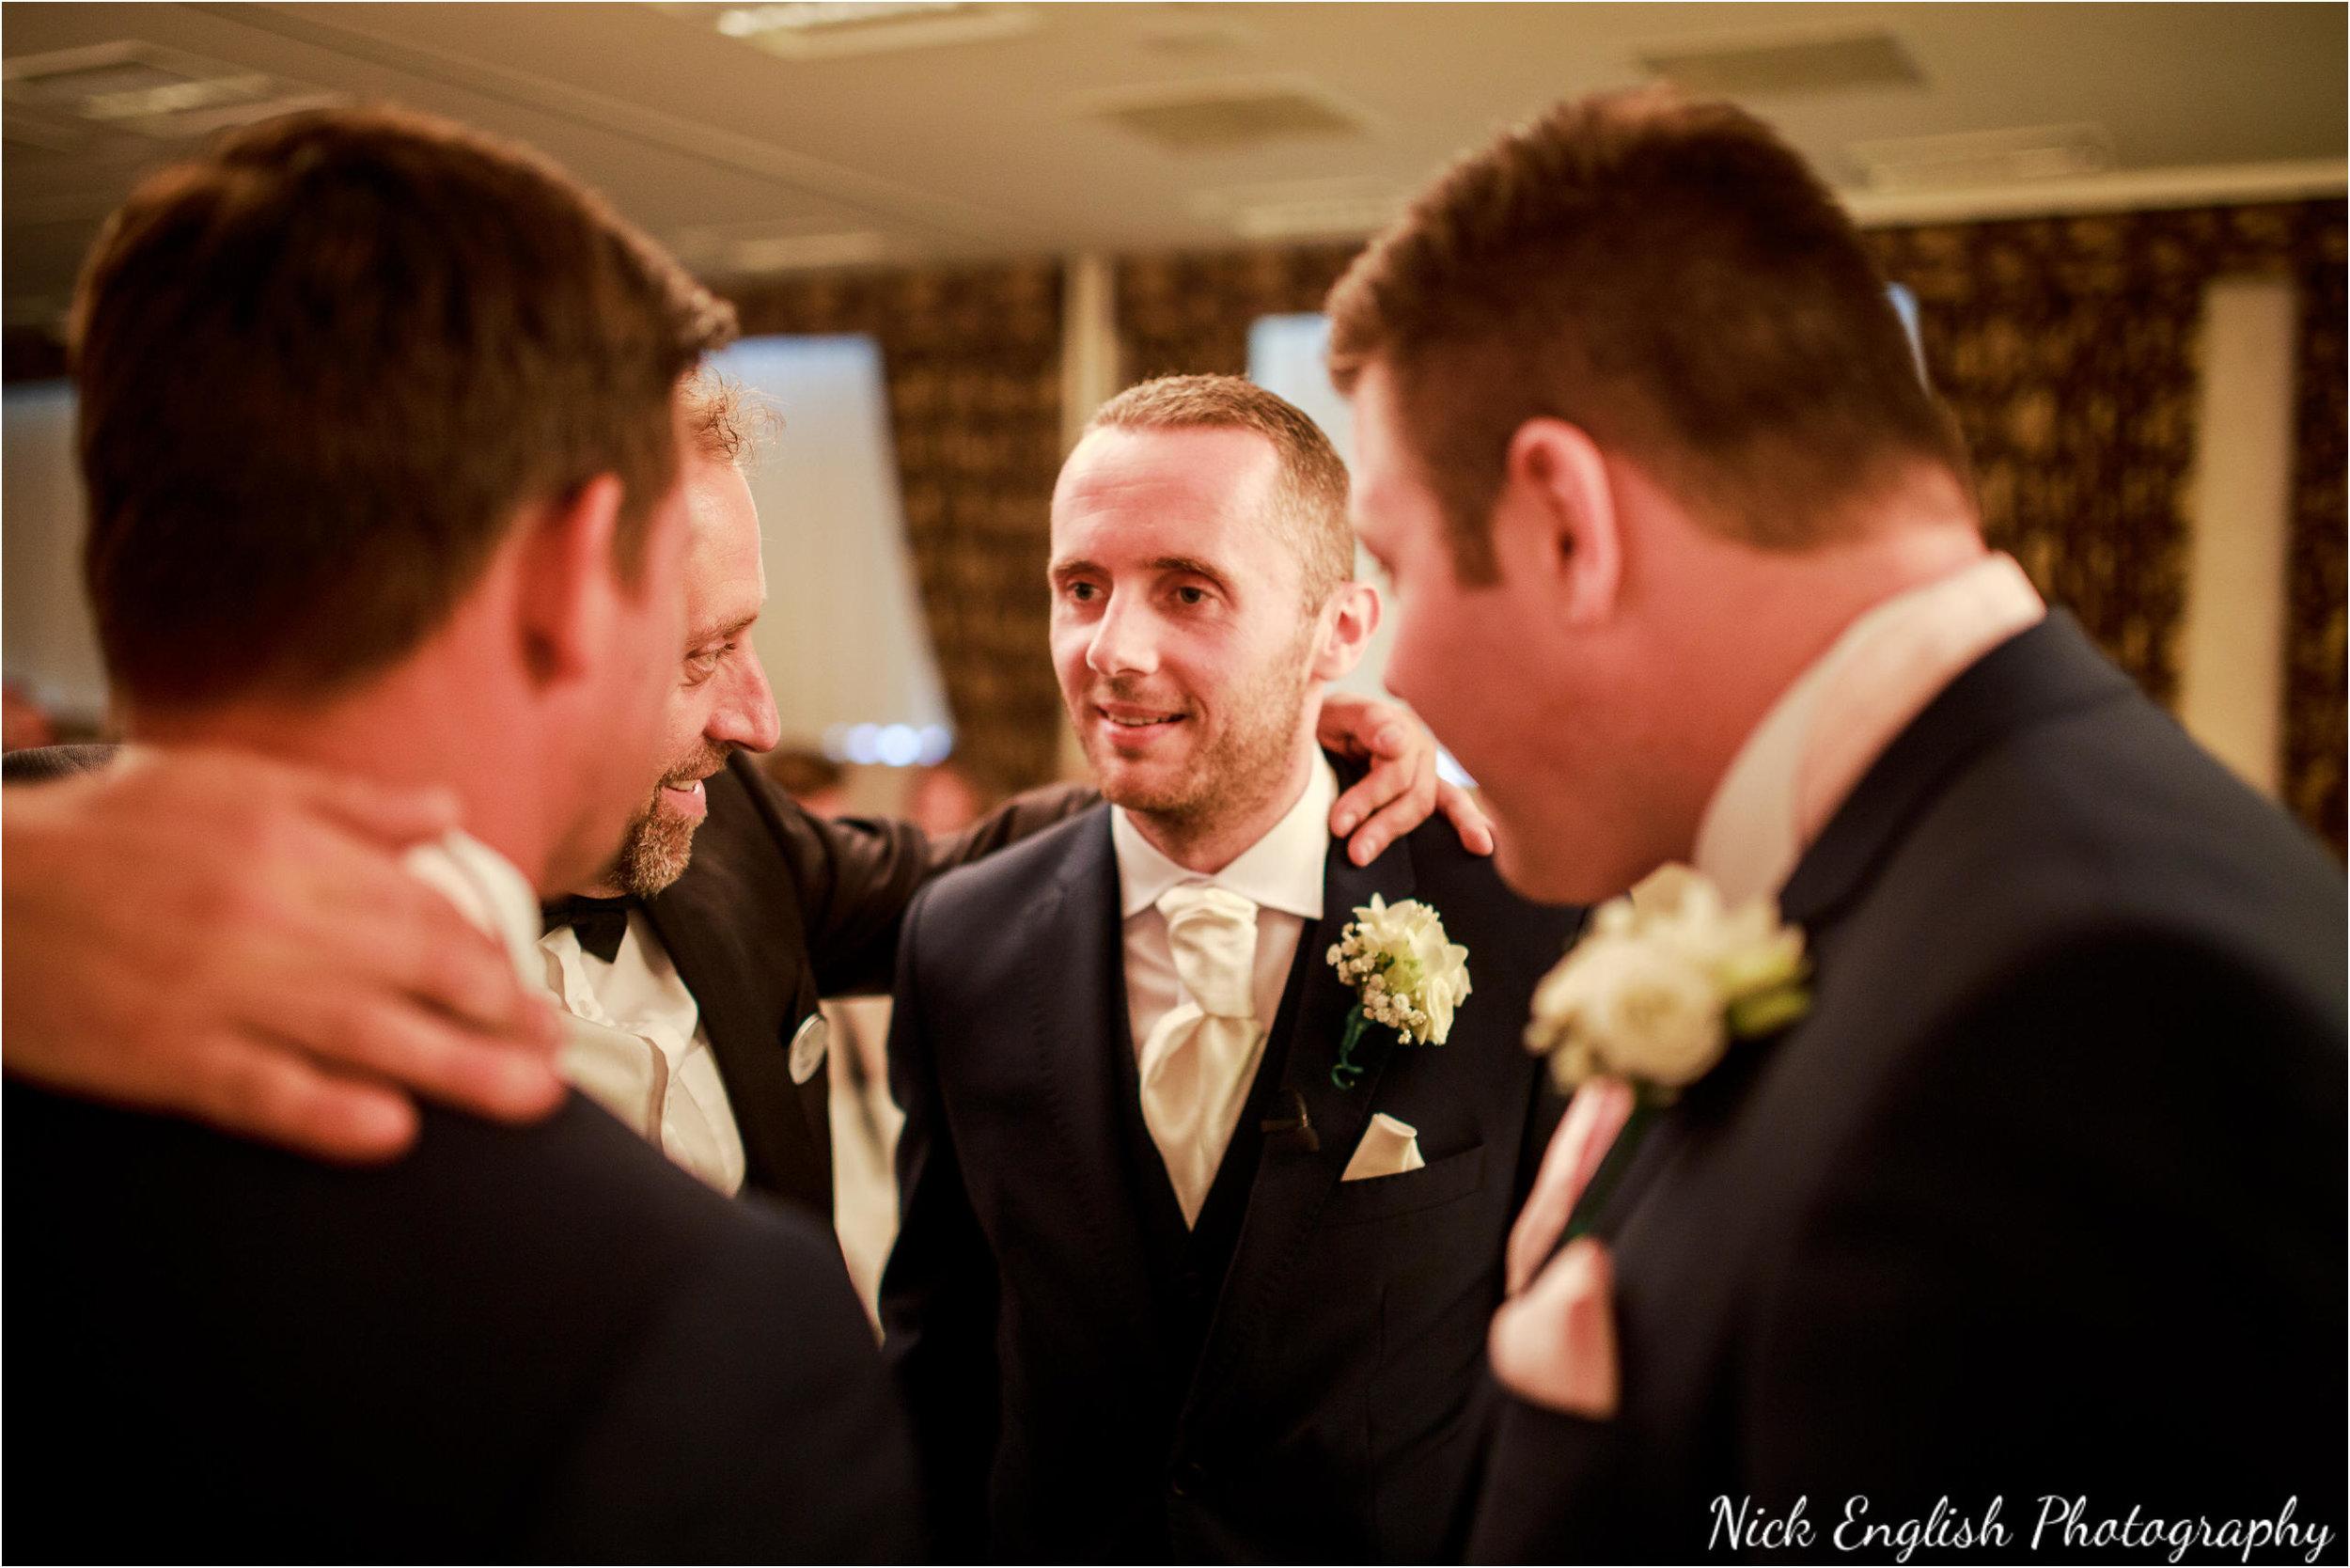 Emily David Wedding Photographs at Barton Grange Preston by Nick English Photography 53jpg.jpeg